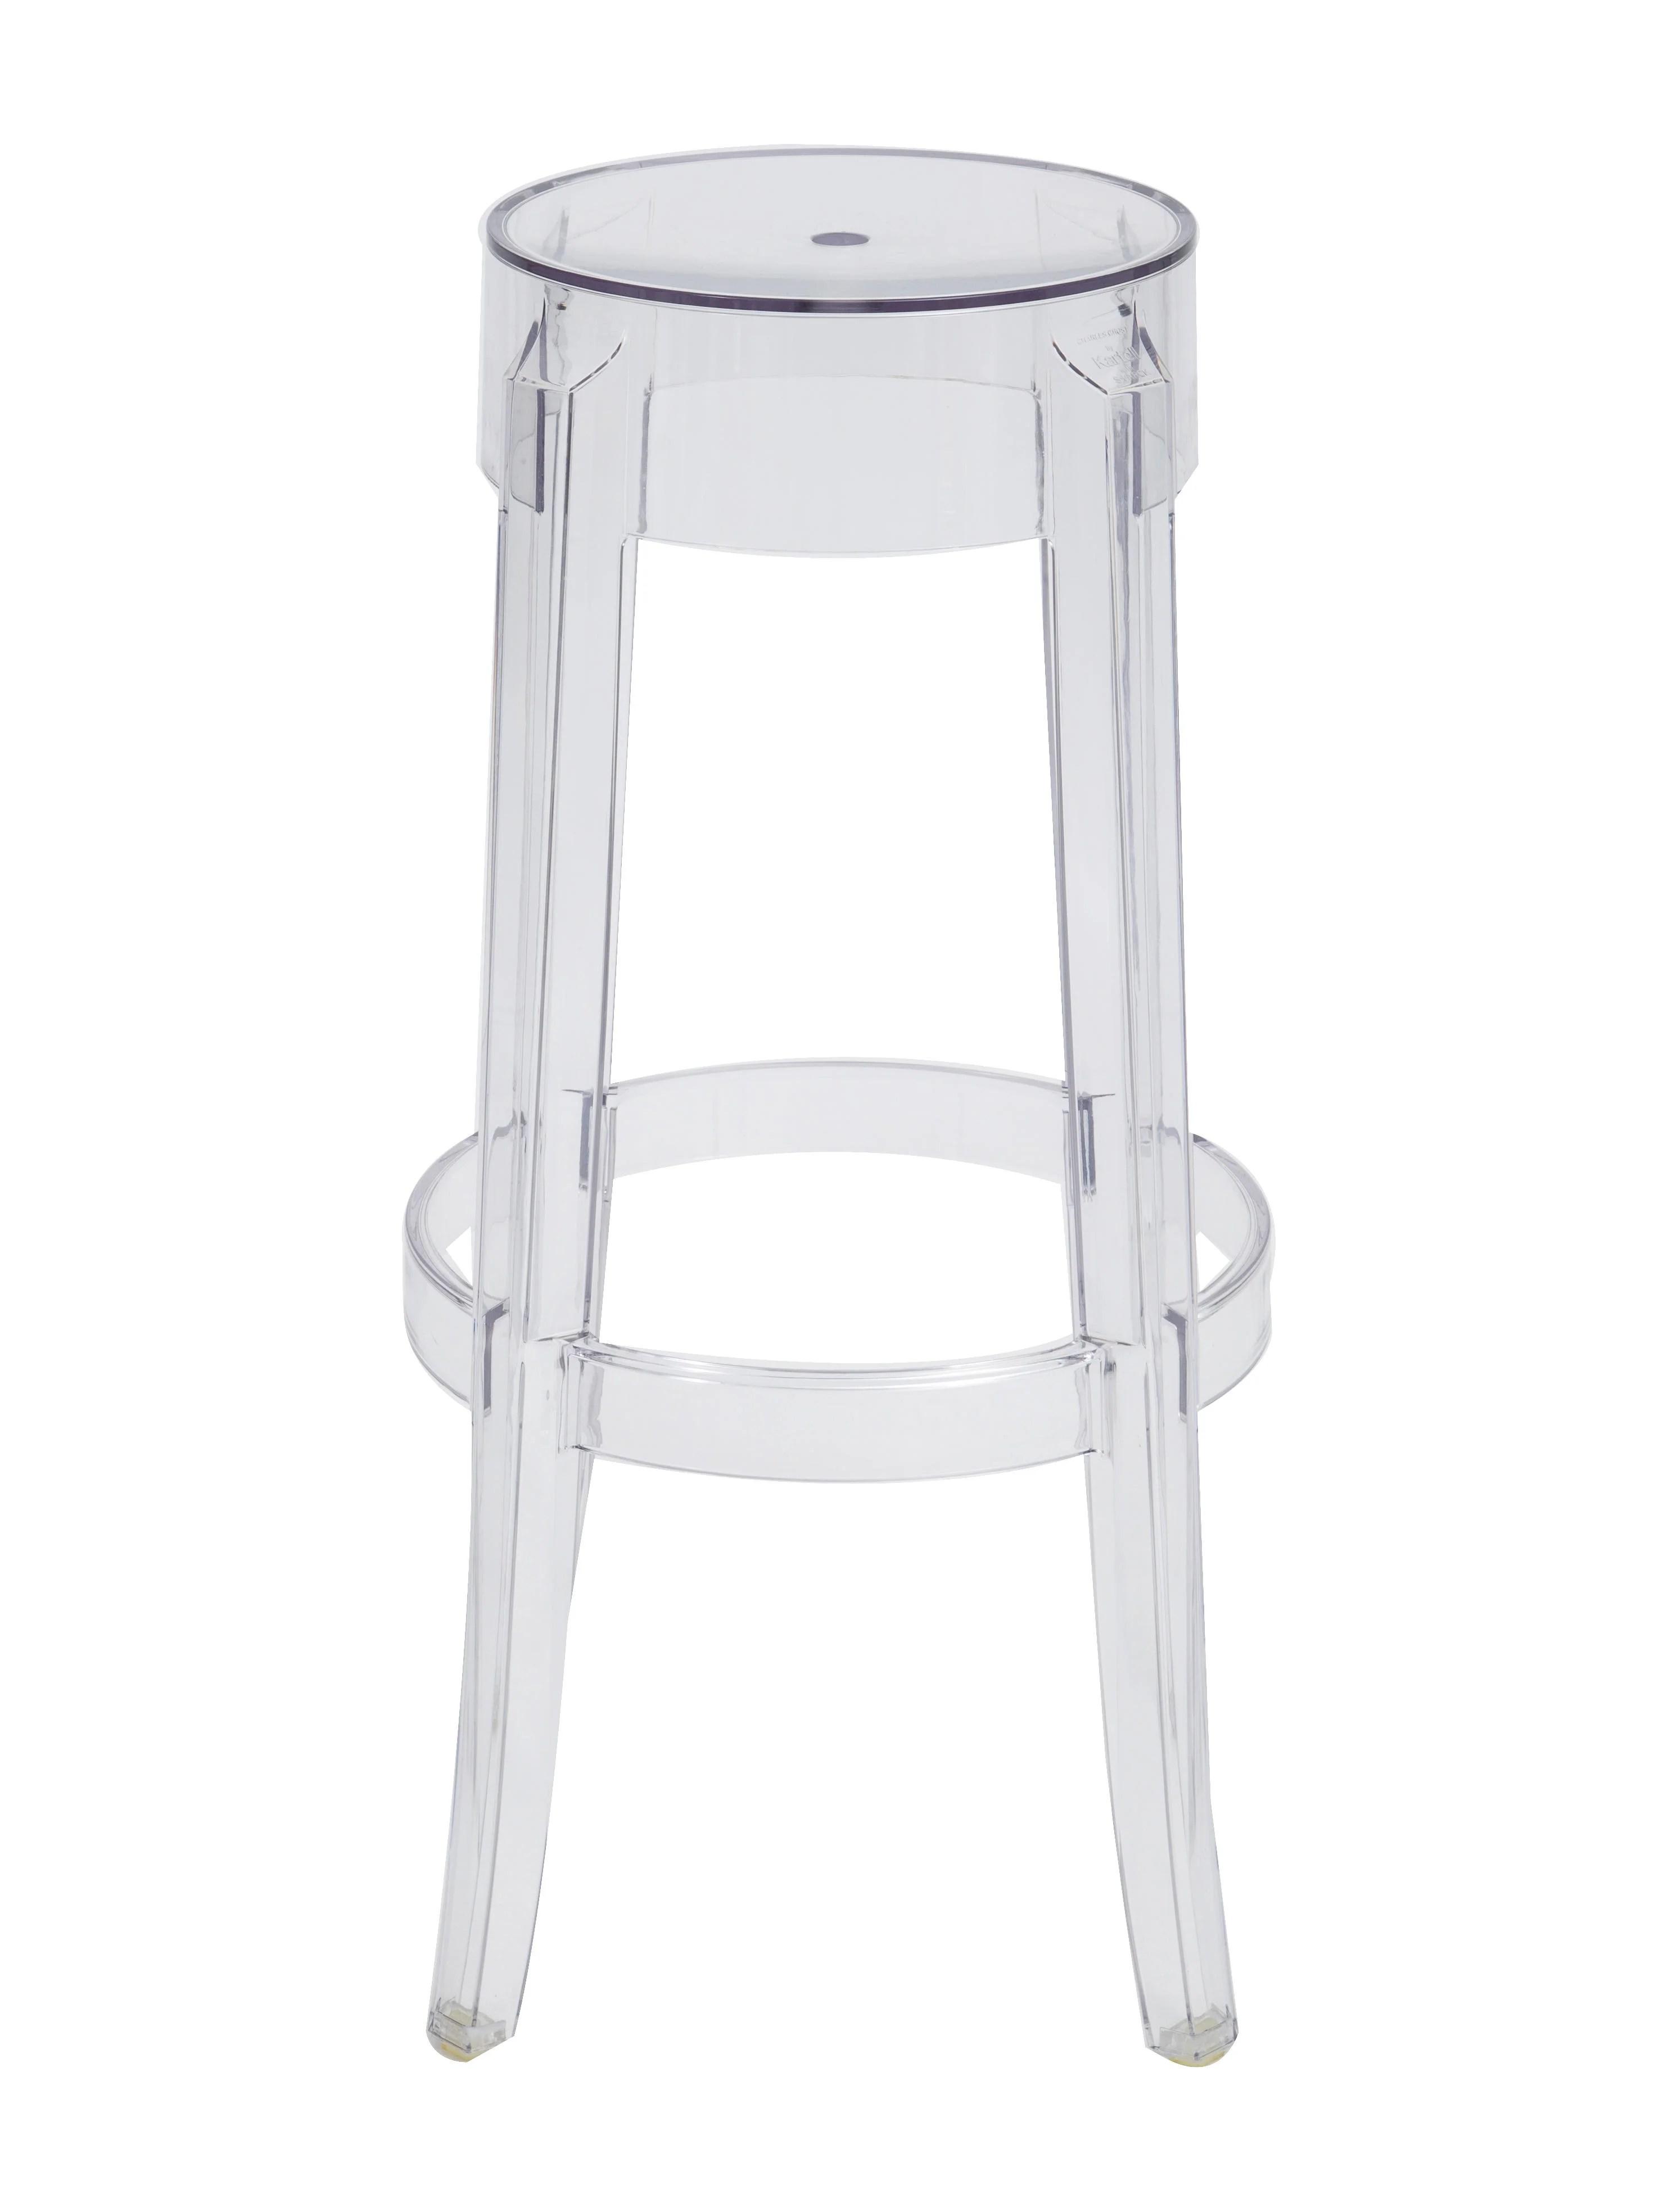 ghost chair bar stool nailhead leather kartell charles stools furniture ktl20102